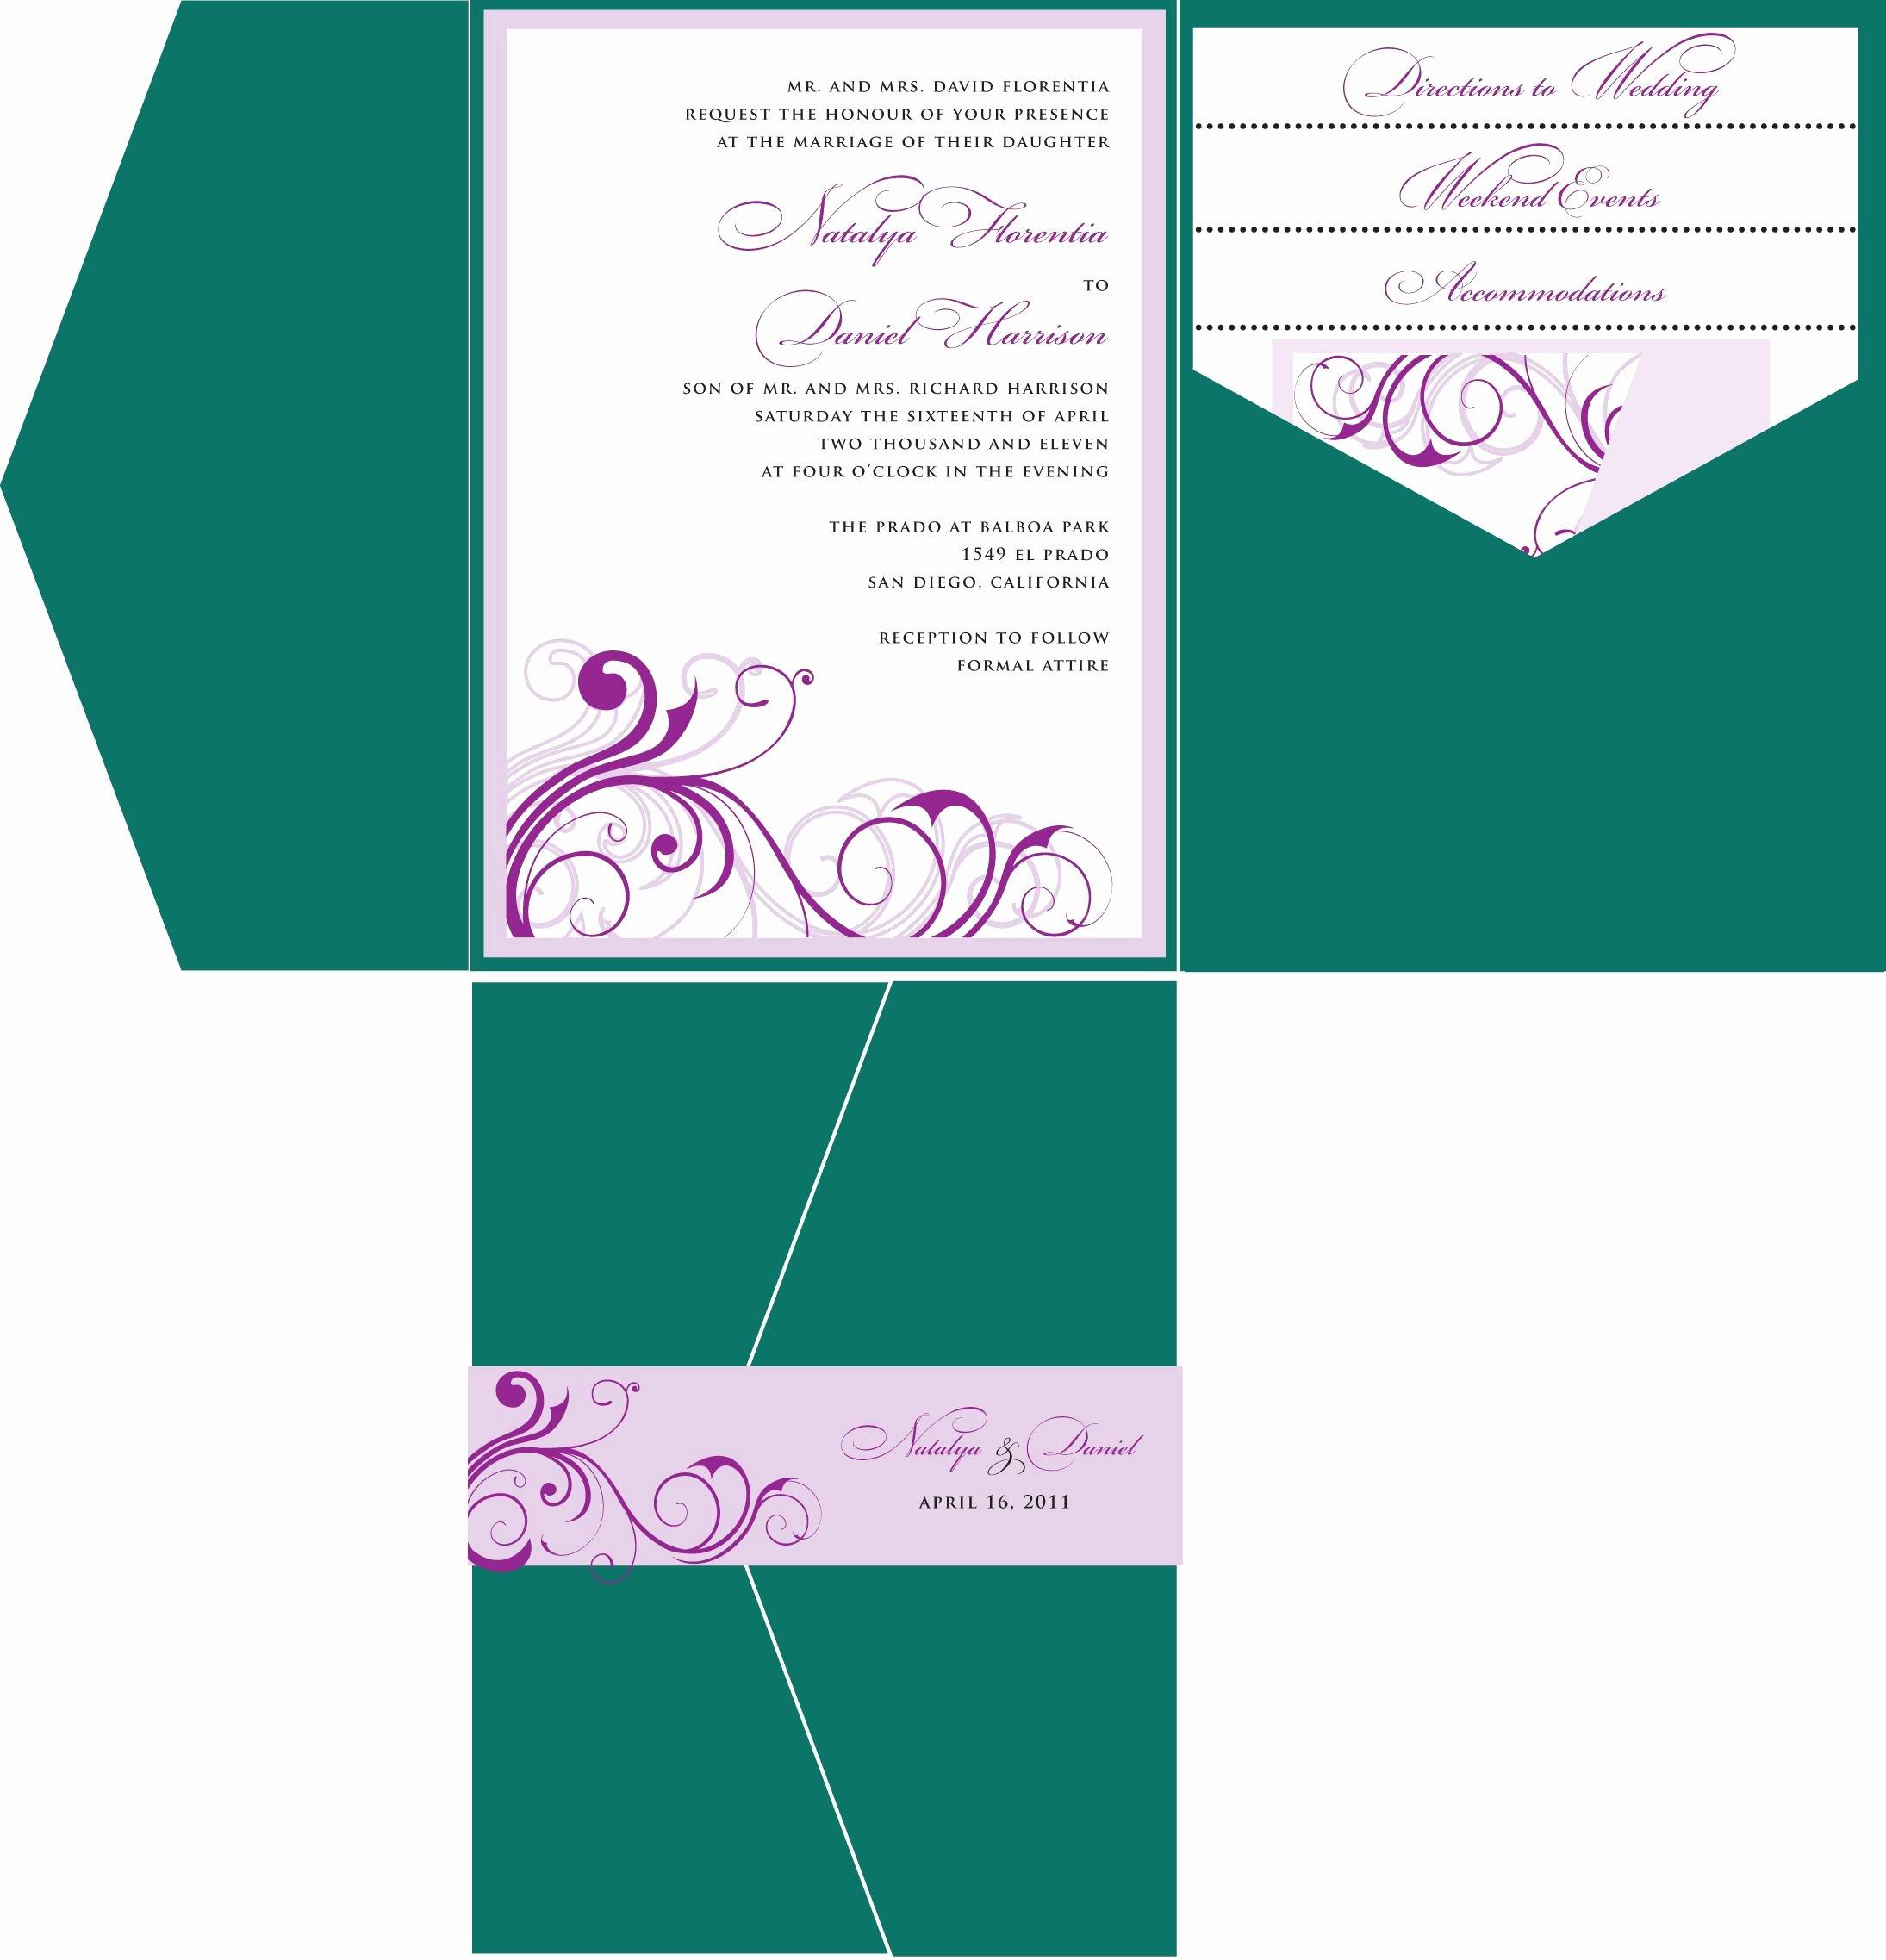 Wedding Invite Template Word Beautiful Wedding Invitations Template Wedding Invitations